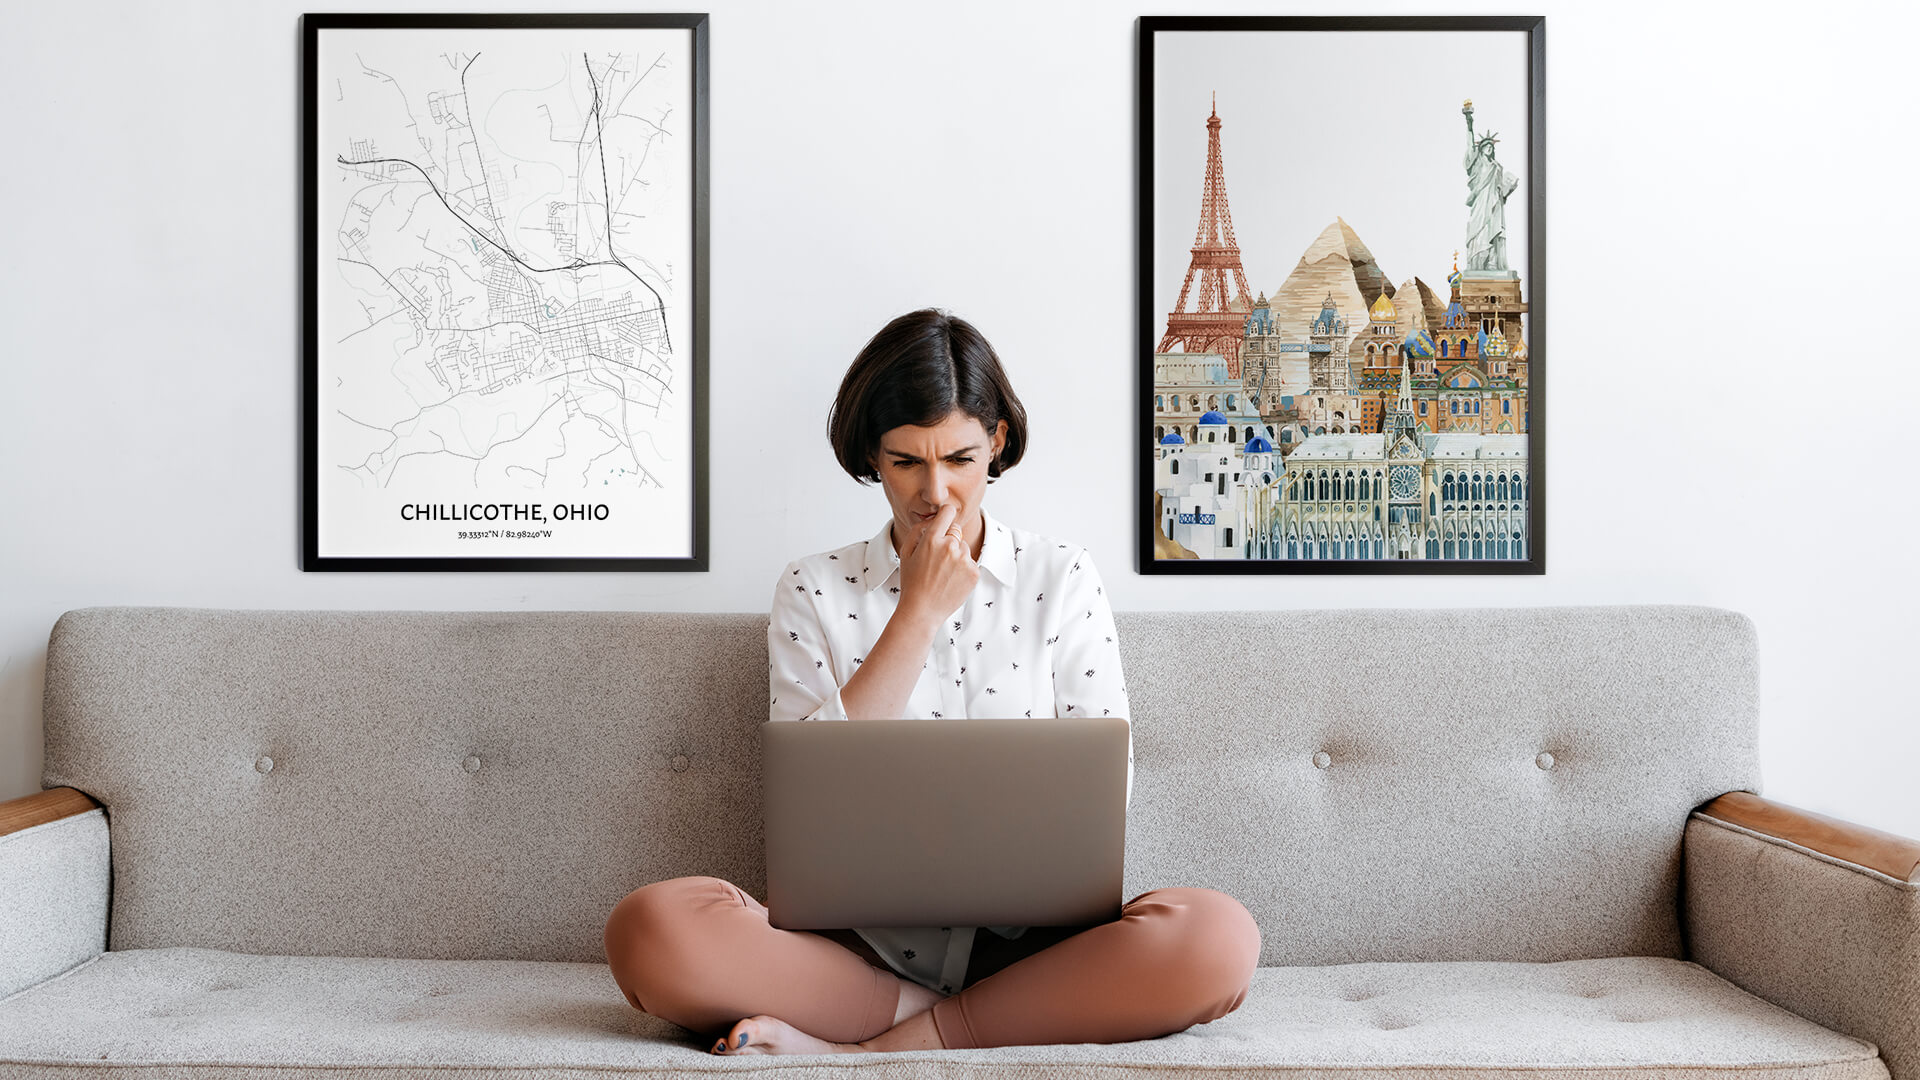 Chillicothe city map art